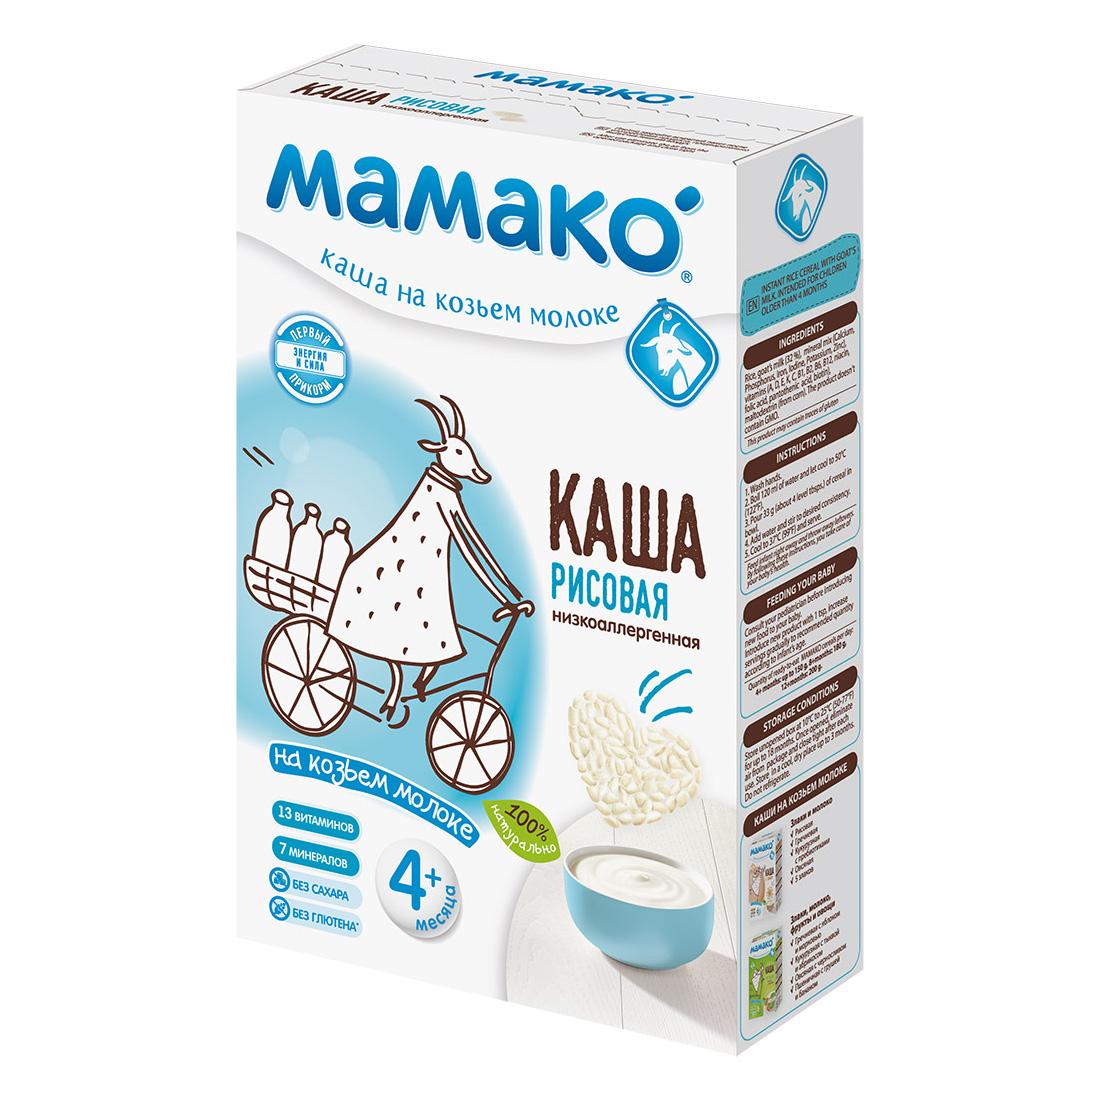 Каша Mamako на козьем молоке 200 гр Рисовая (с 4 мес)<br>